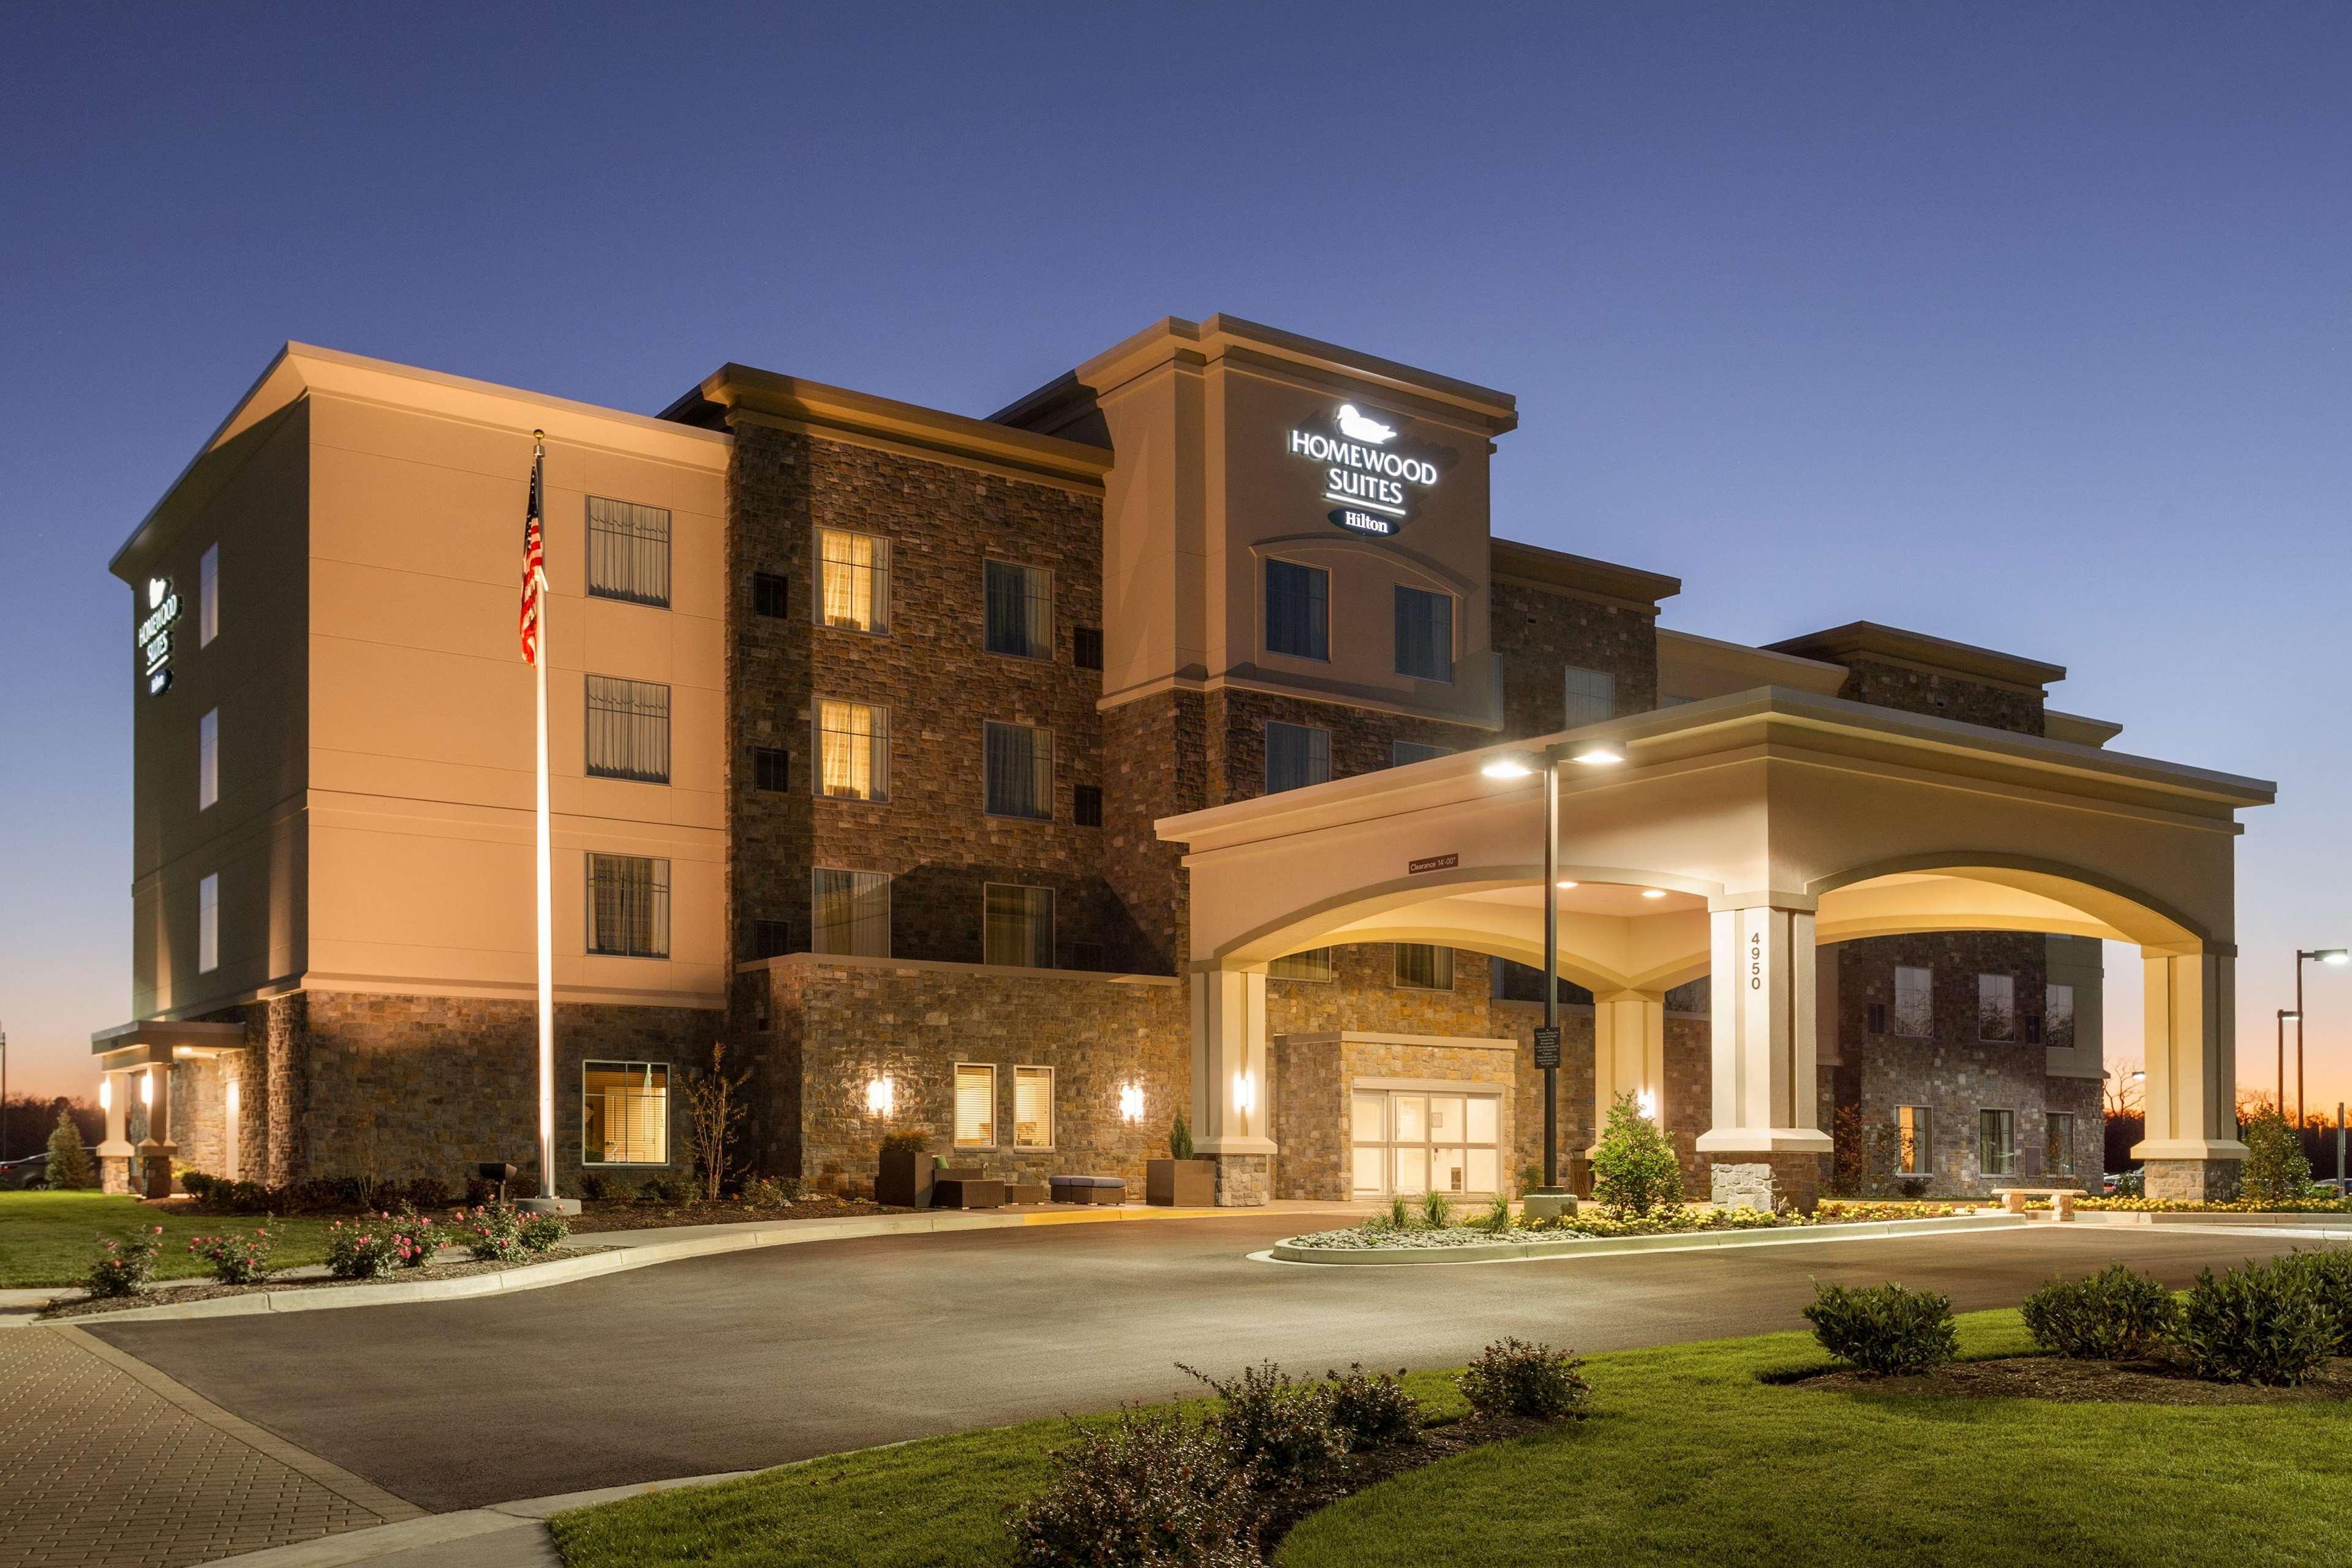 Hotels Motels Frederick Md